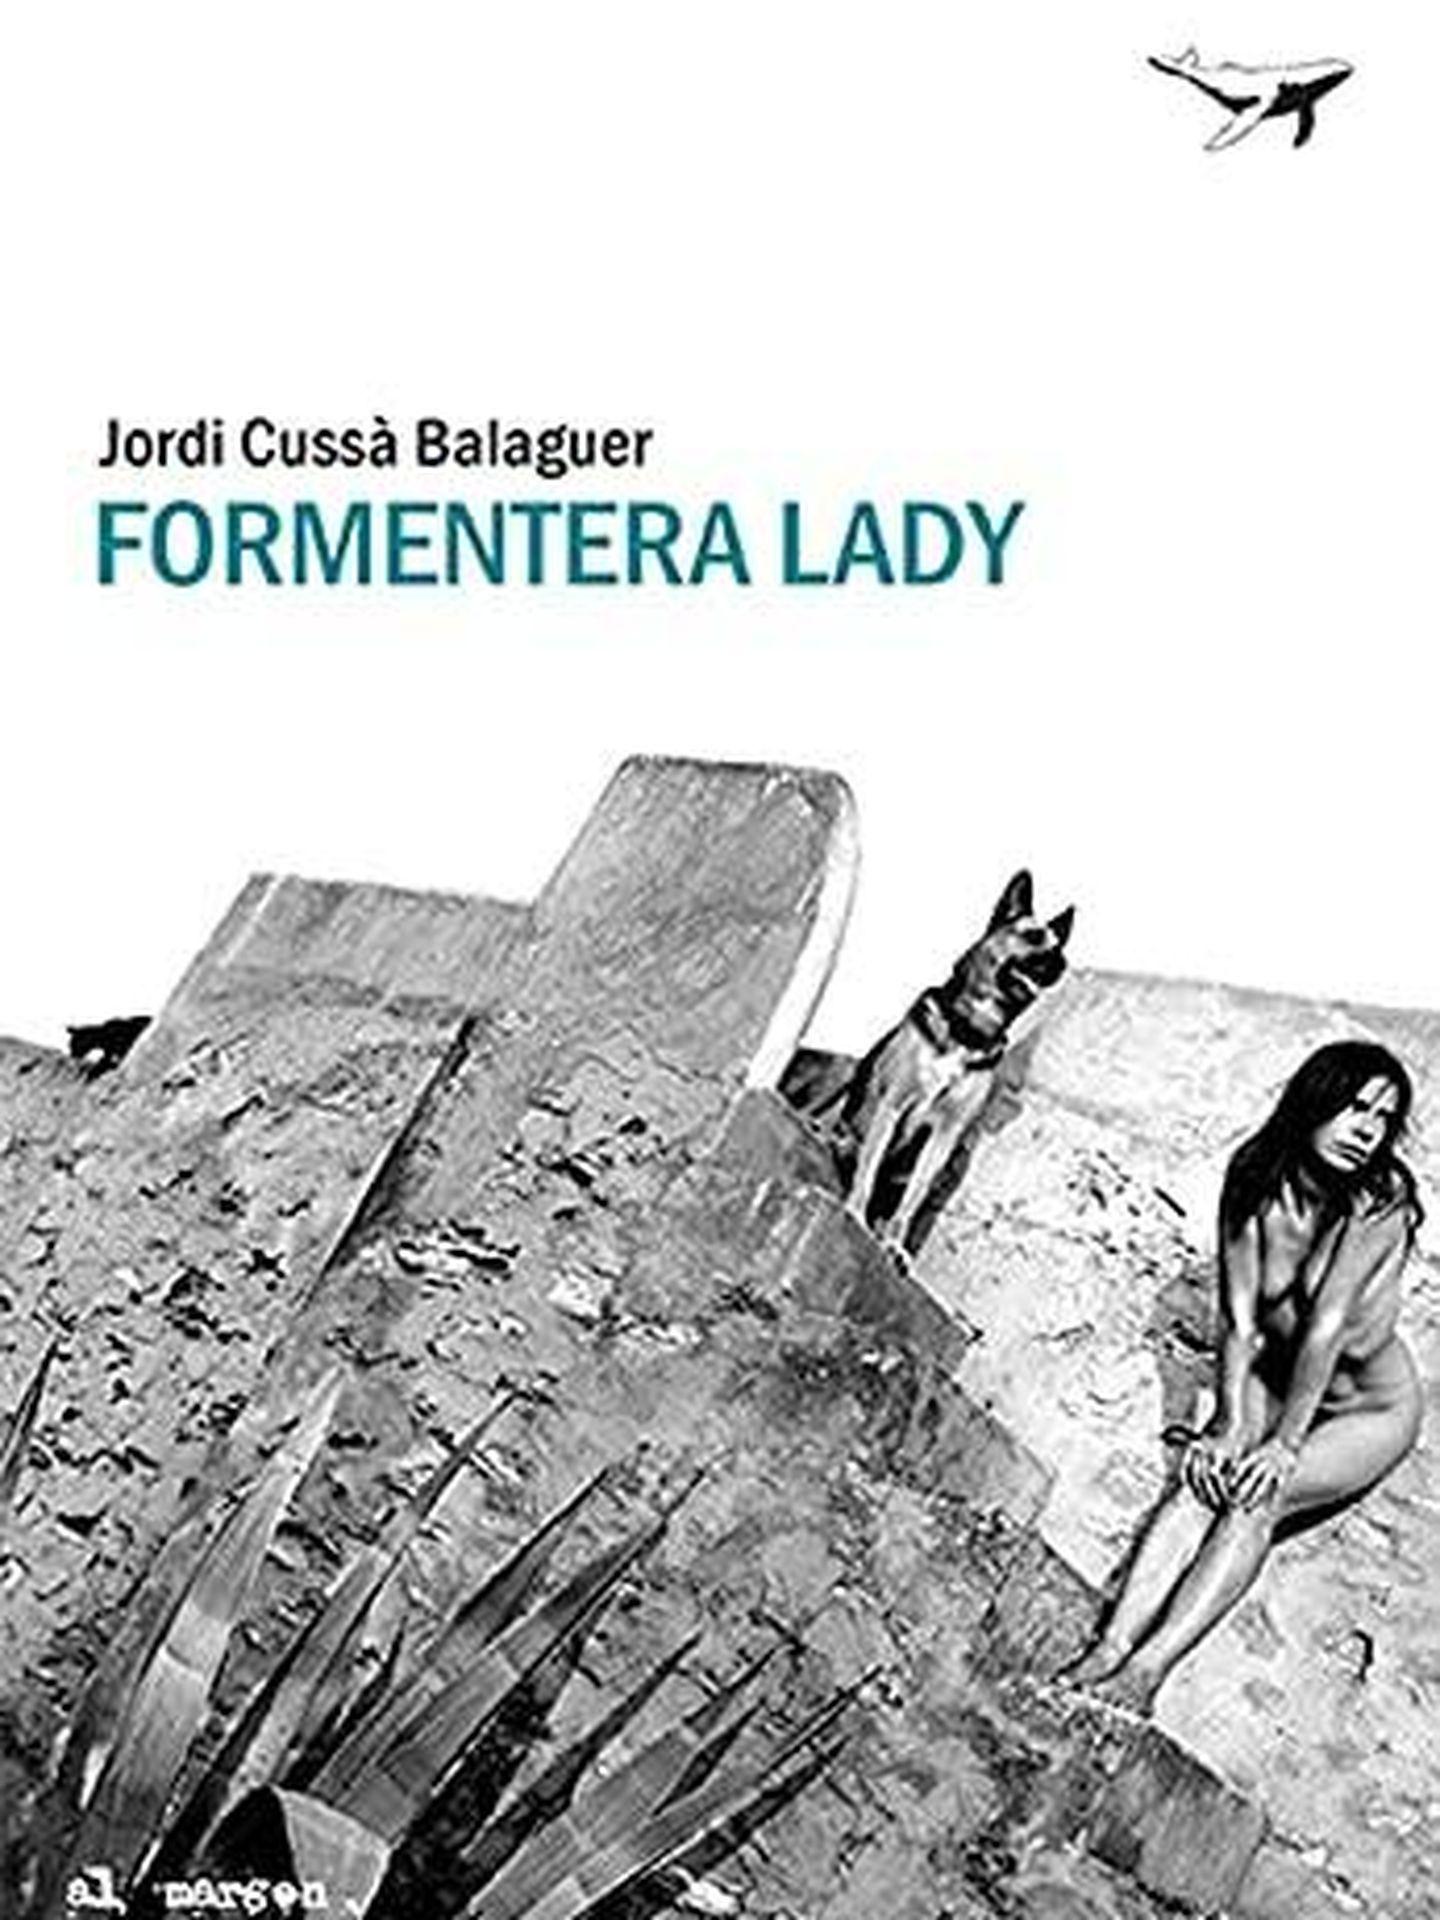 'Formentera Lady'.